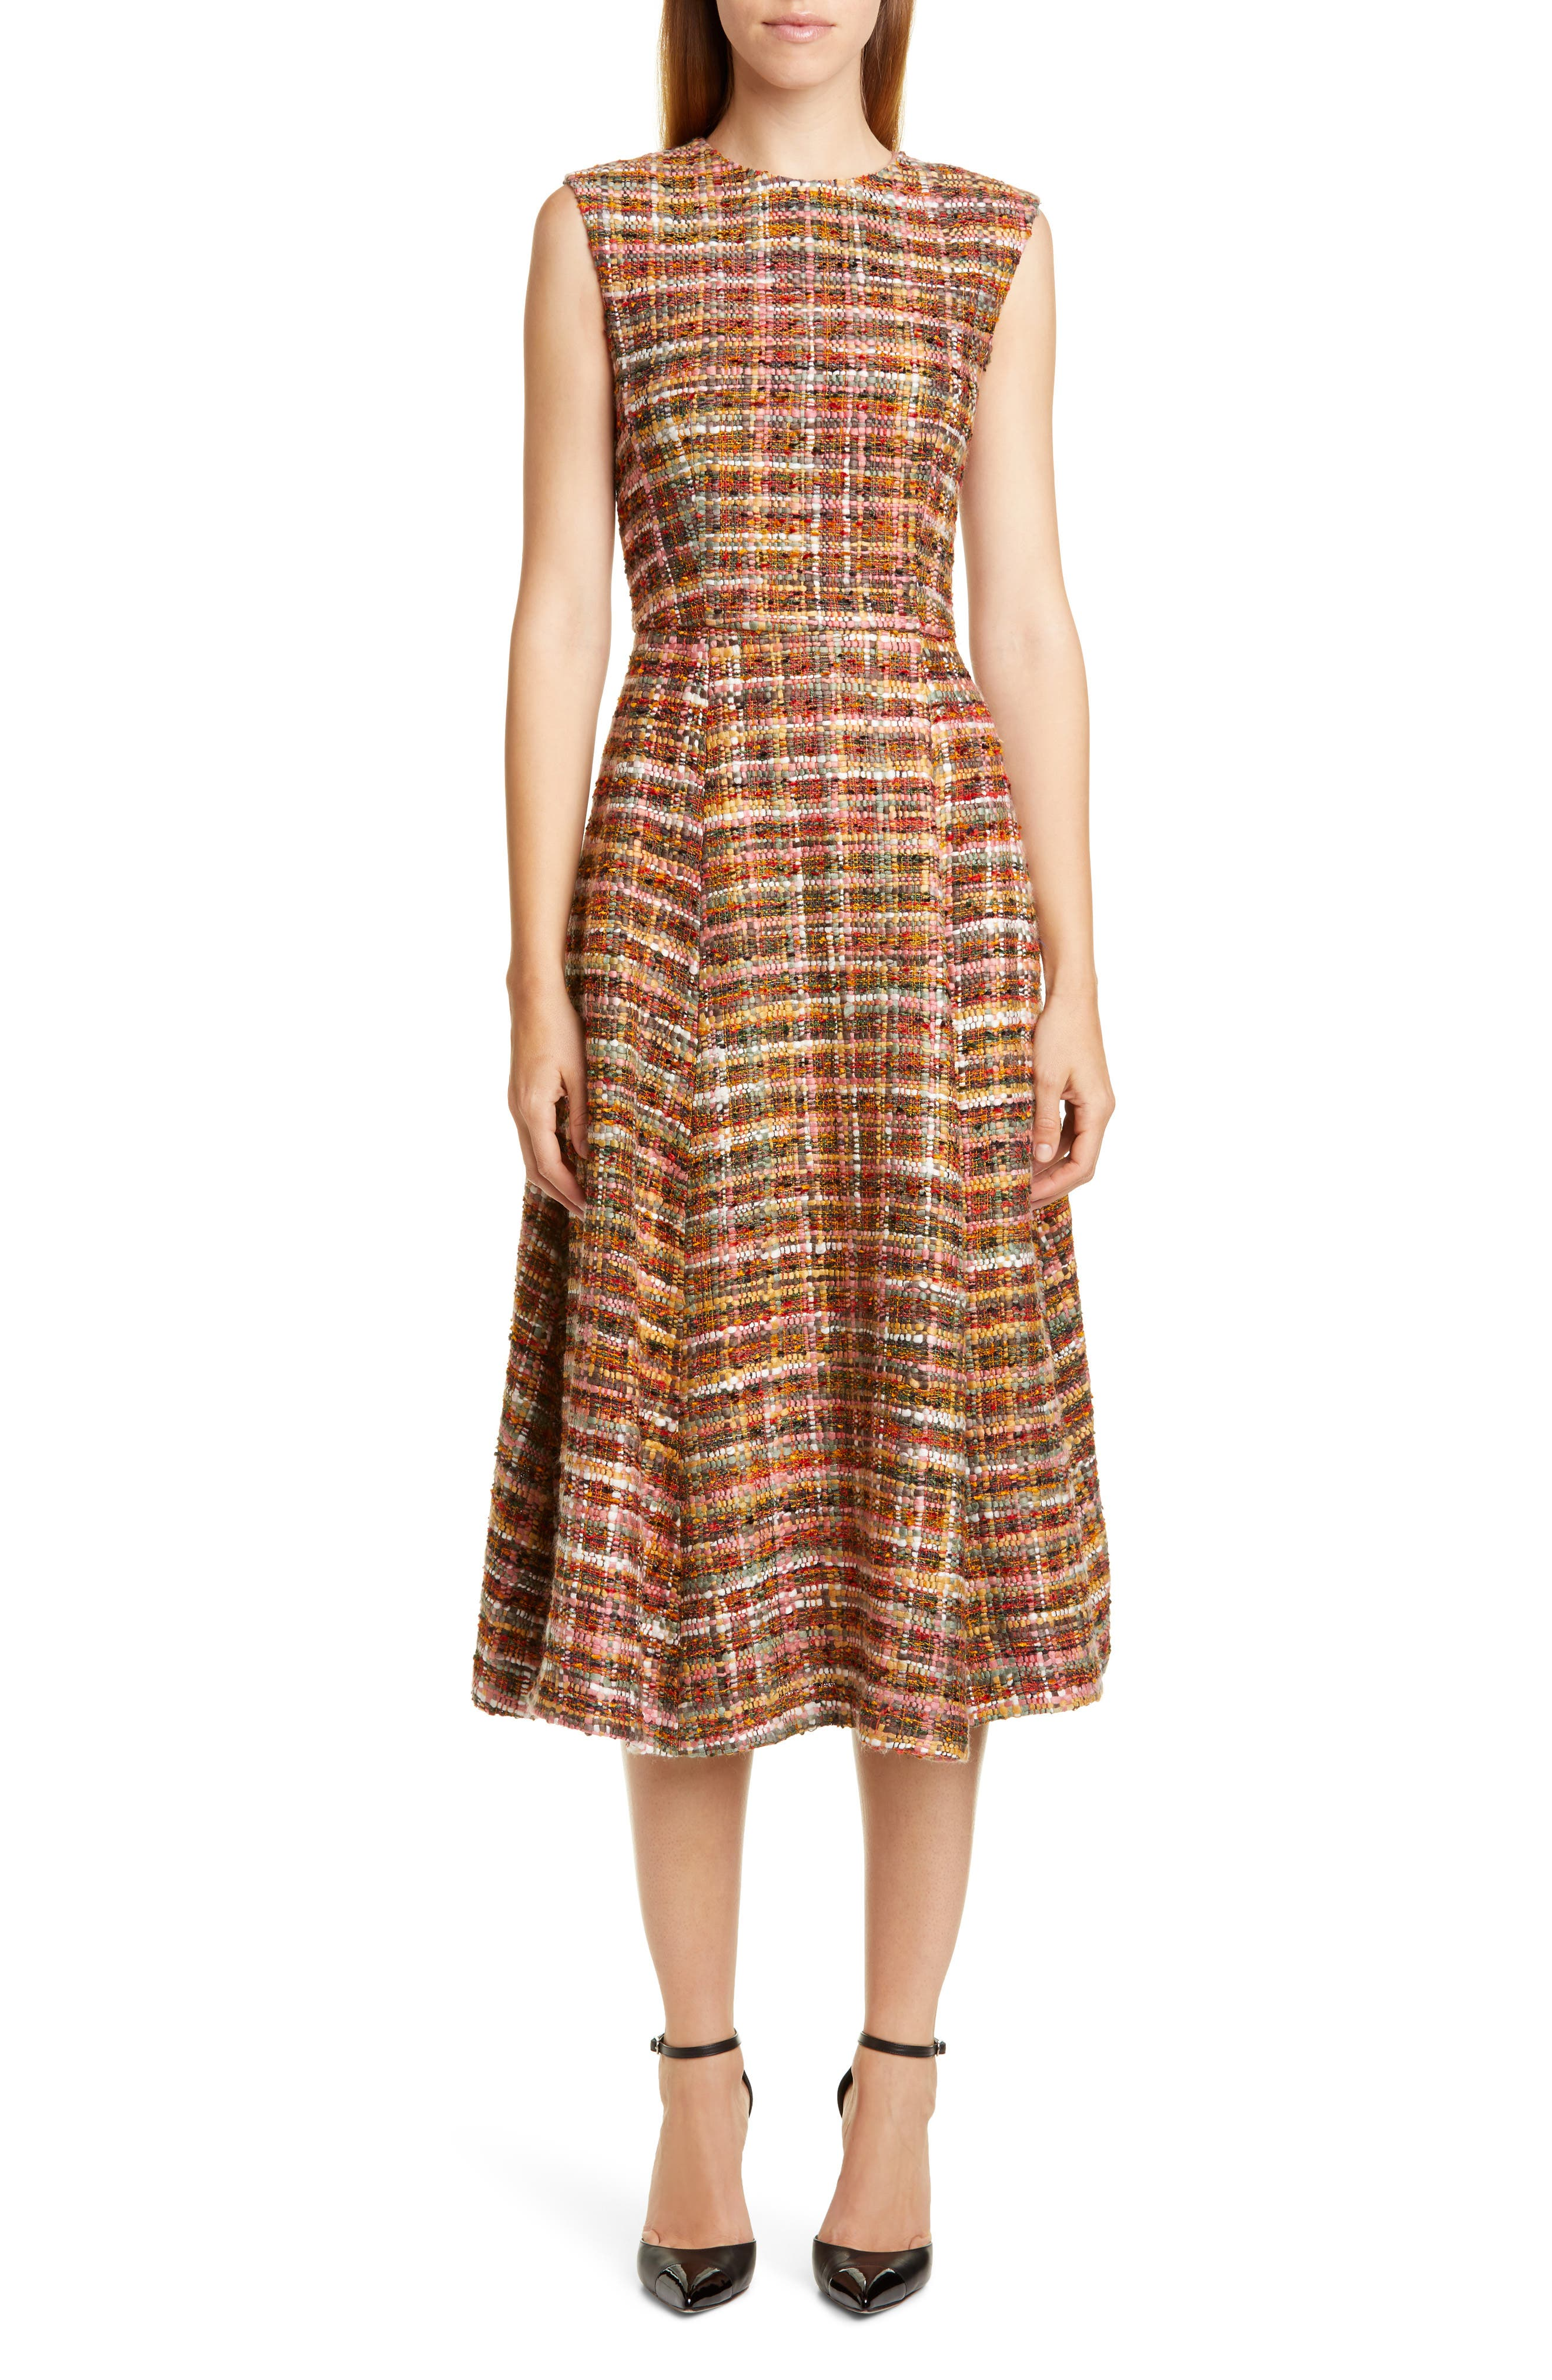 Adam Lippes Dresses Tweed Fit & Flare Dress